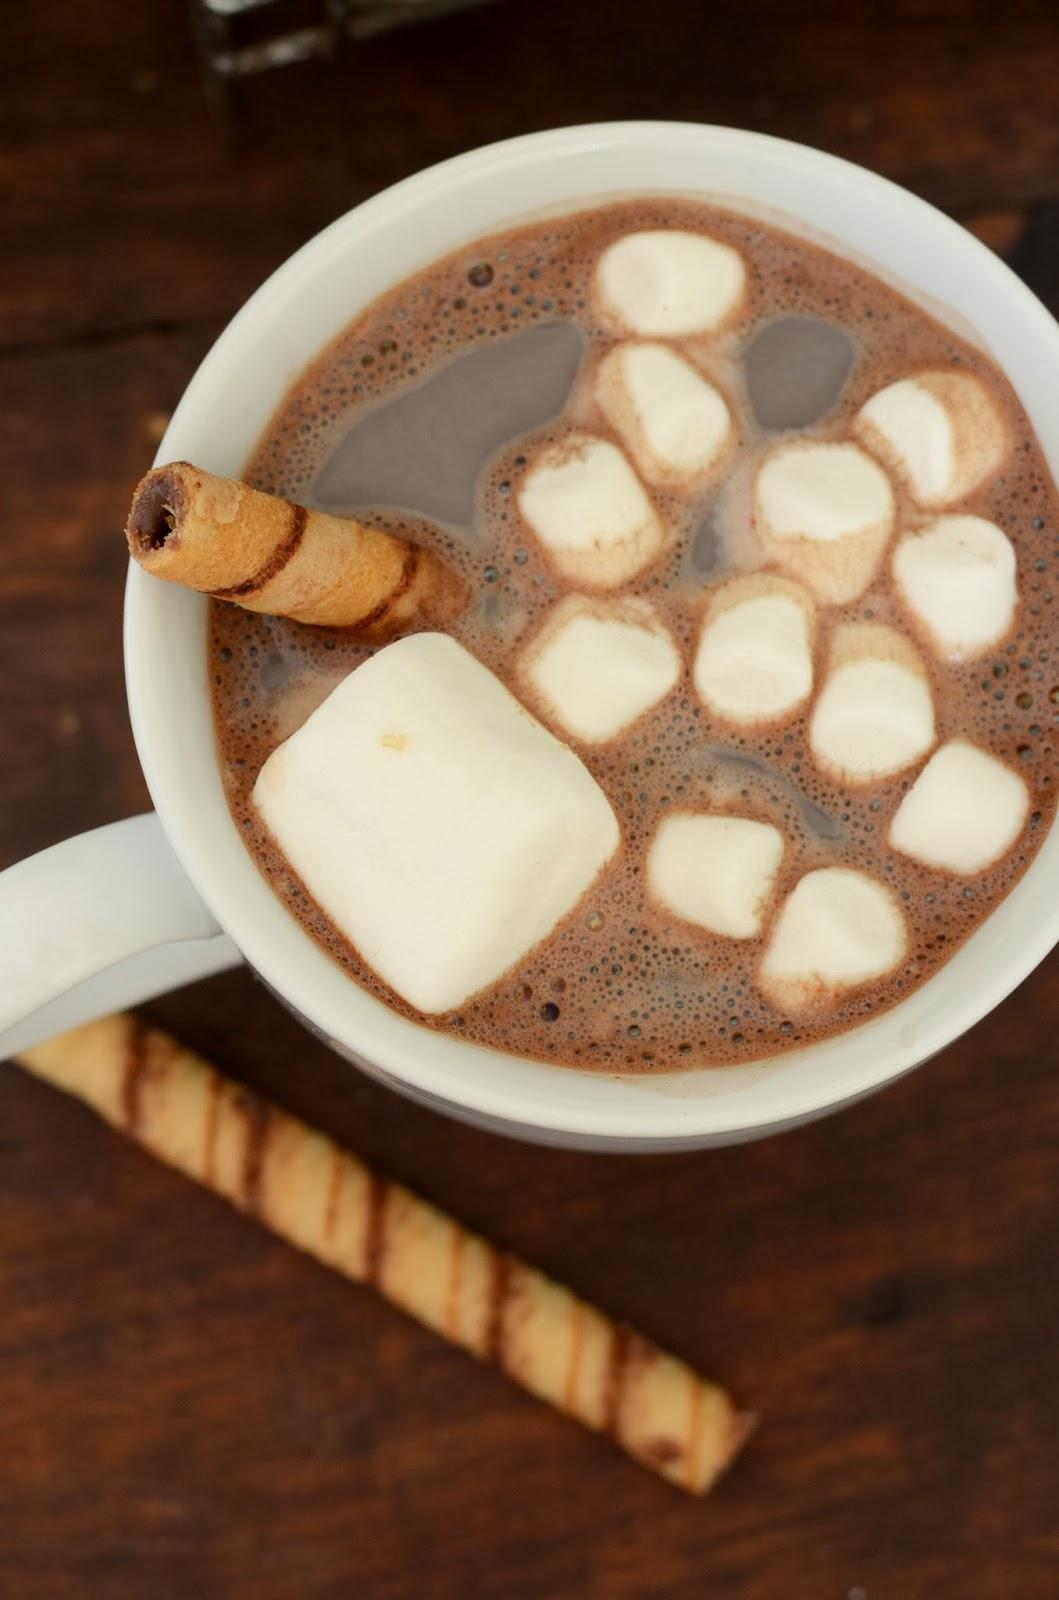 Iron Amp Twine Hot Chocolate Station